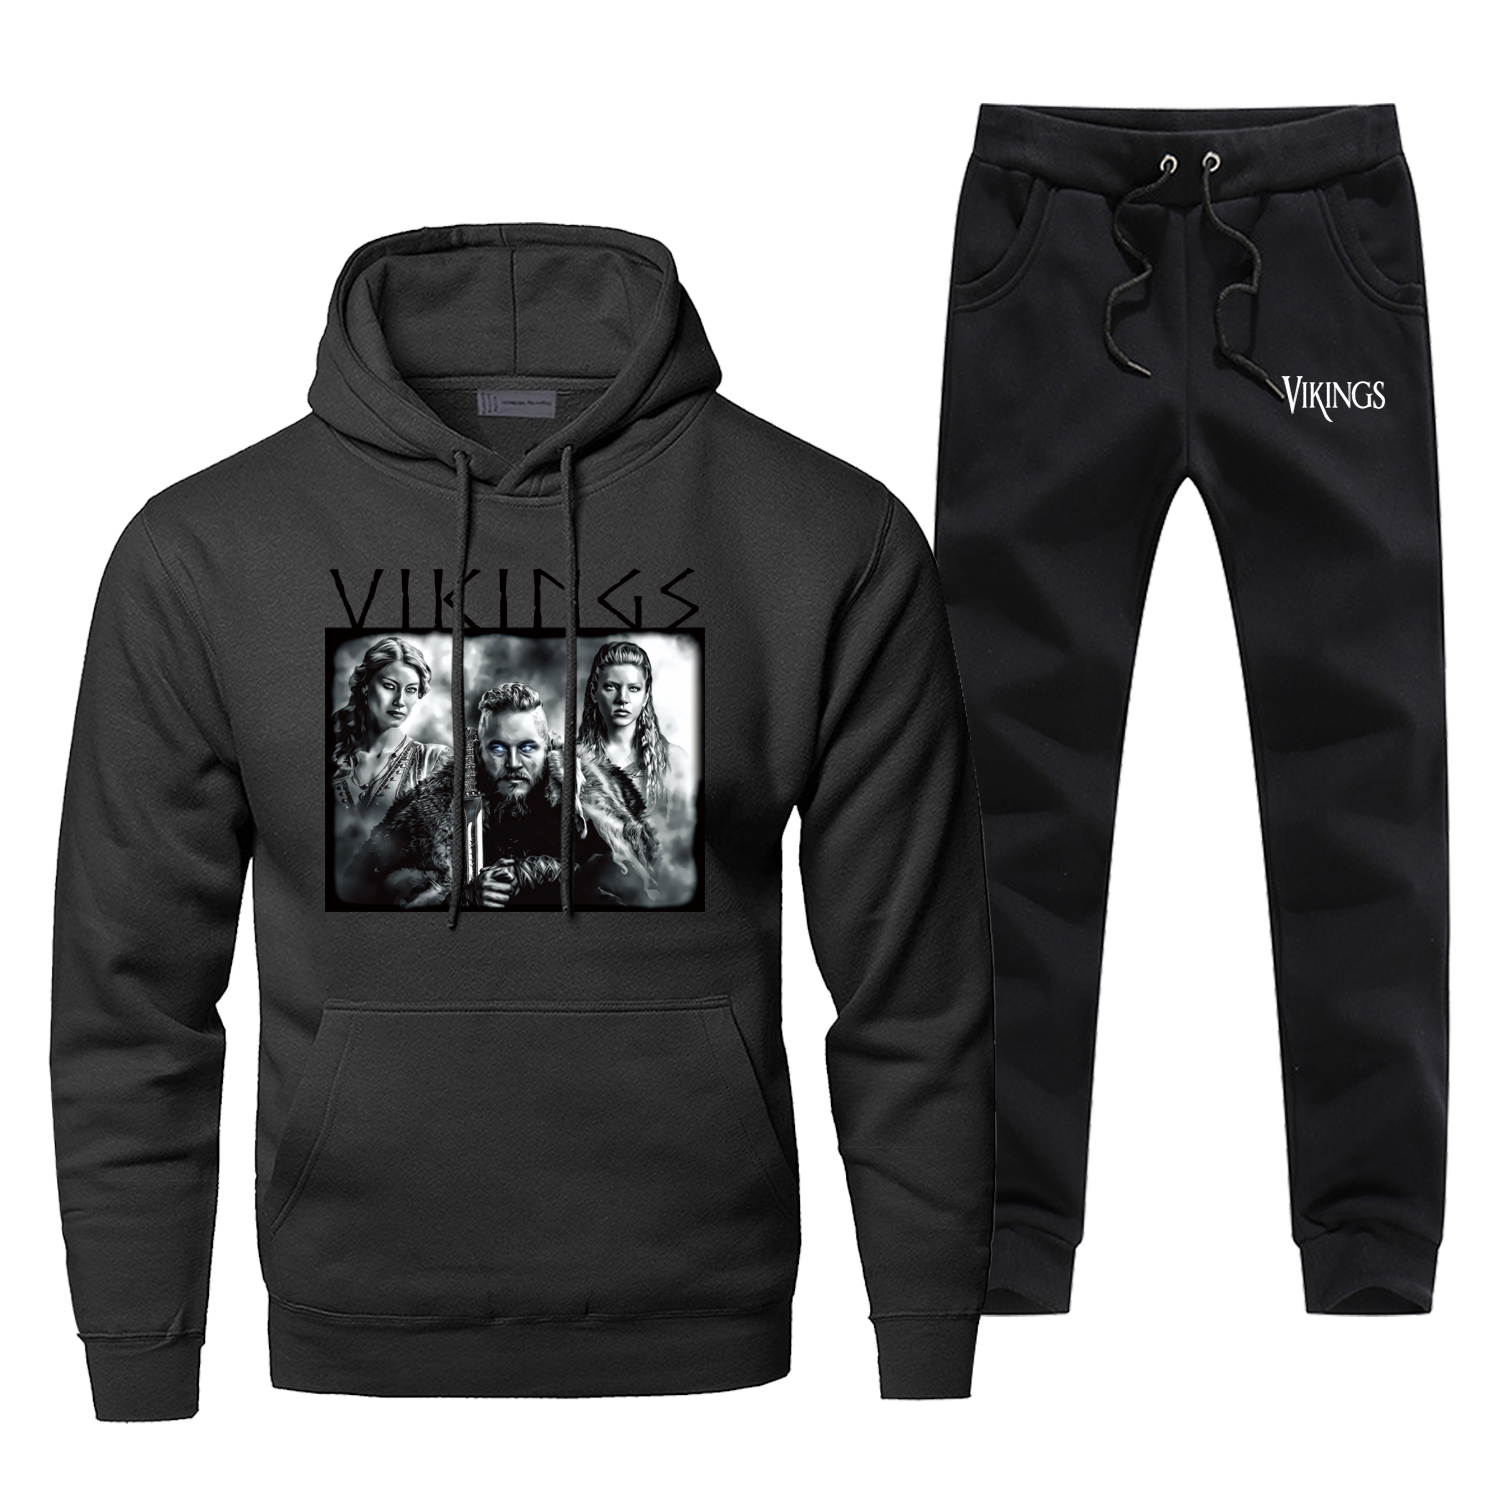 Odin Vikings Hoodies Men Die In Battle And Go To Valhalla Hoodie Pants Sets Men Casual Fleece Sweatshirt Sportswear Streetwear